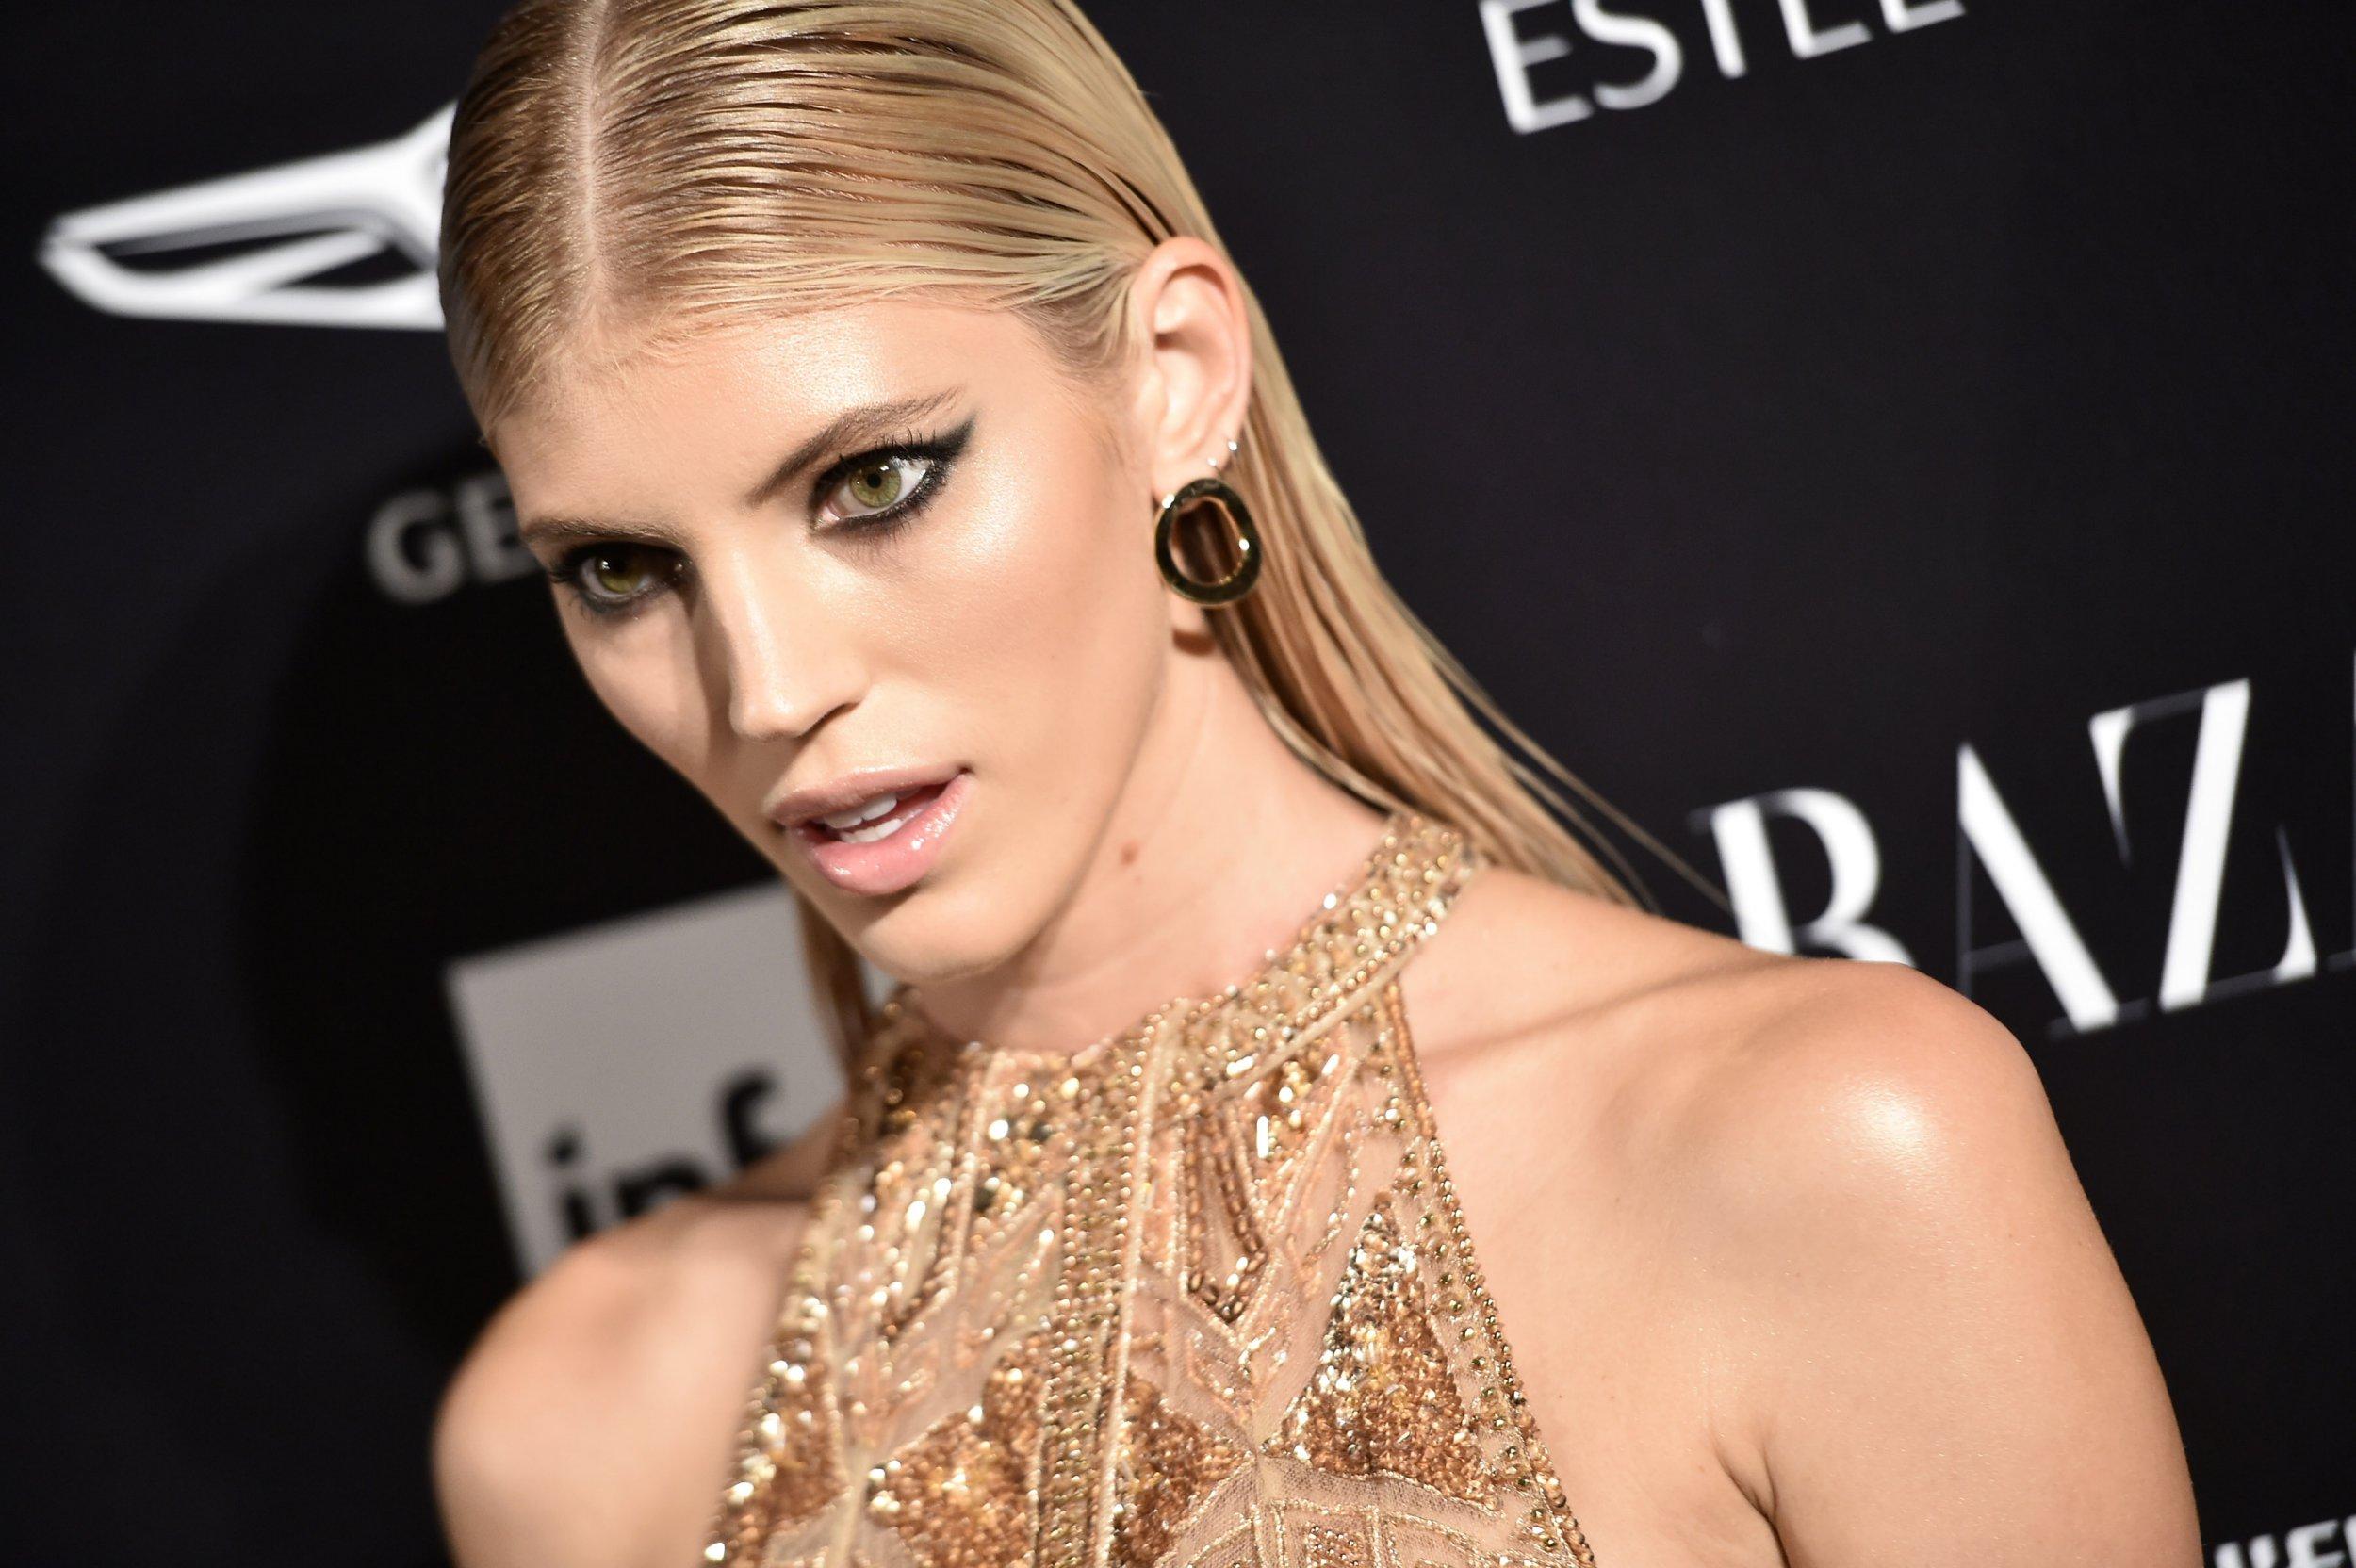 Model Devon Windsor criticised for 'tone-deaf' comments on diversity